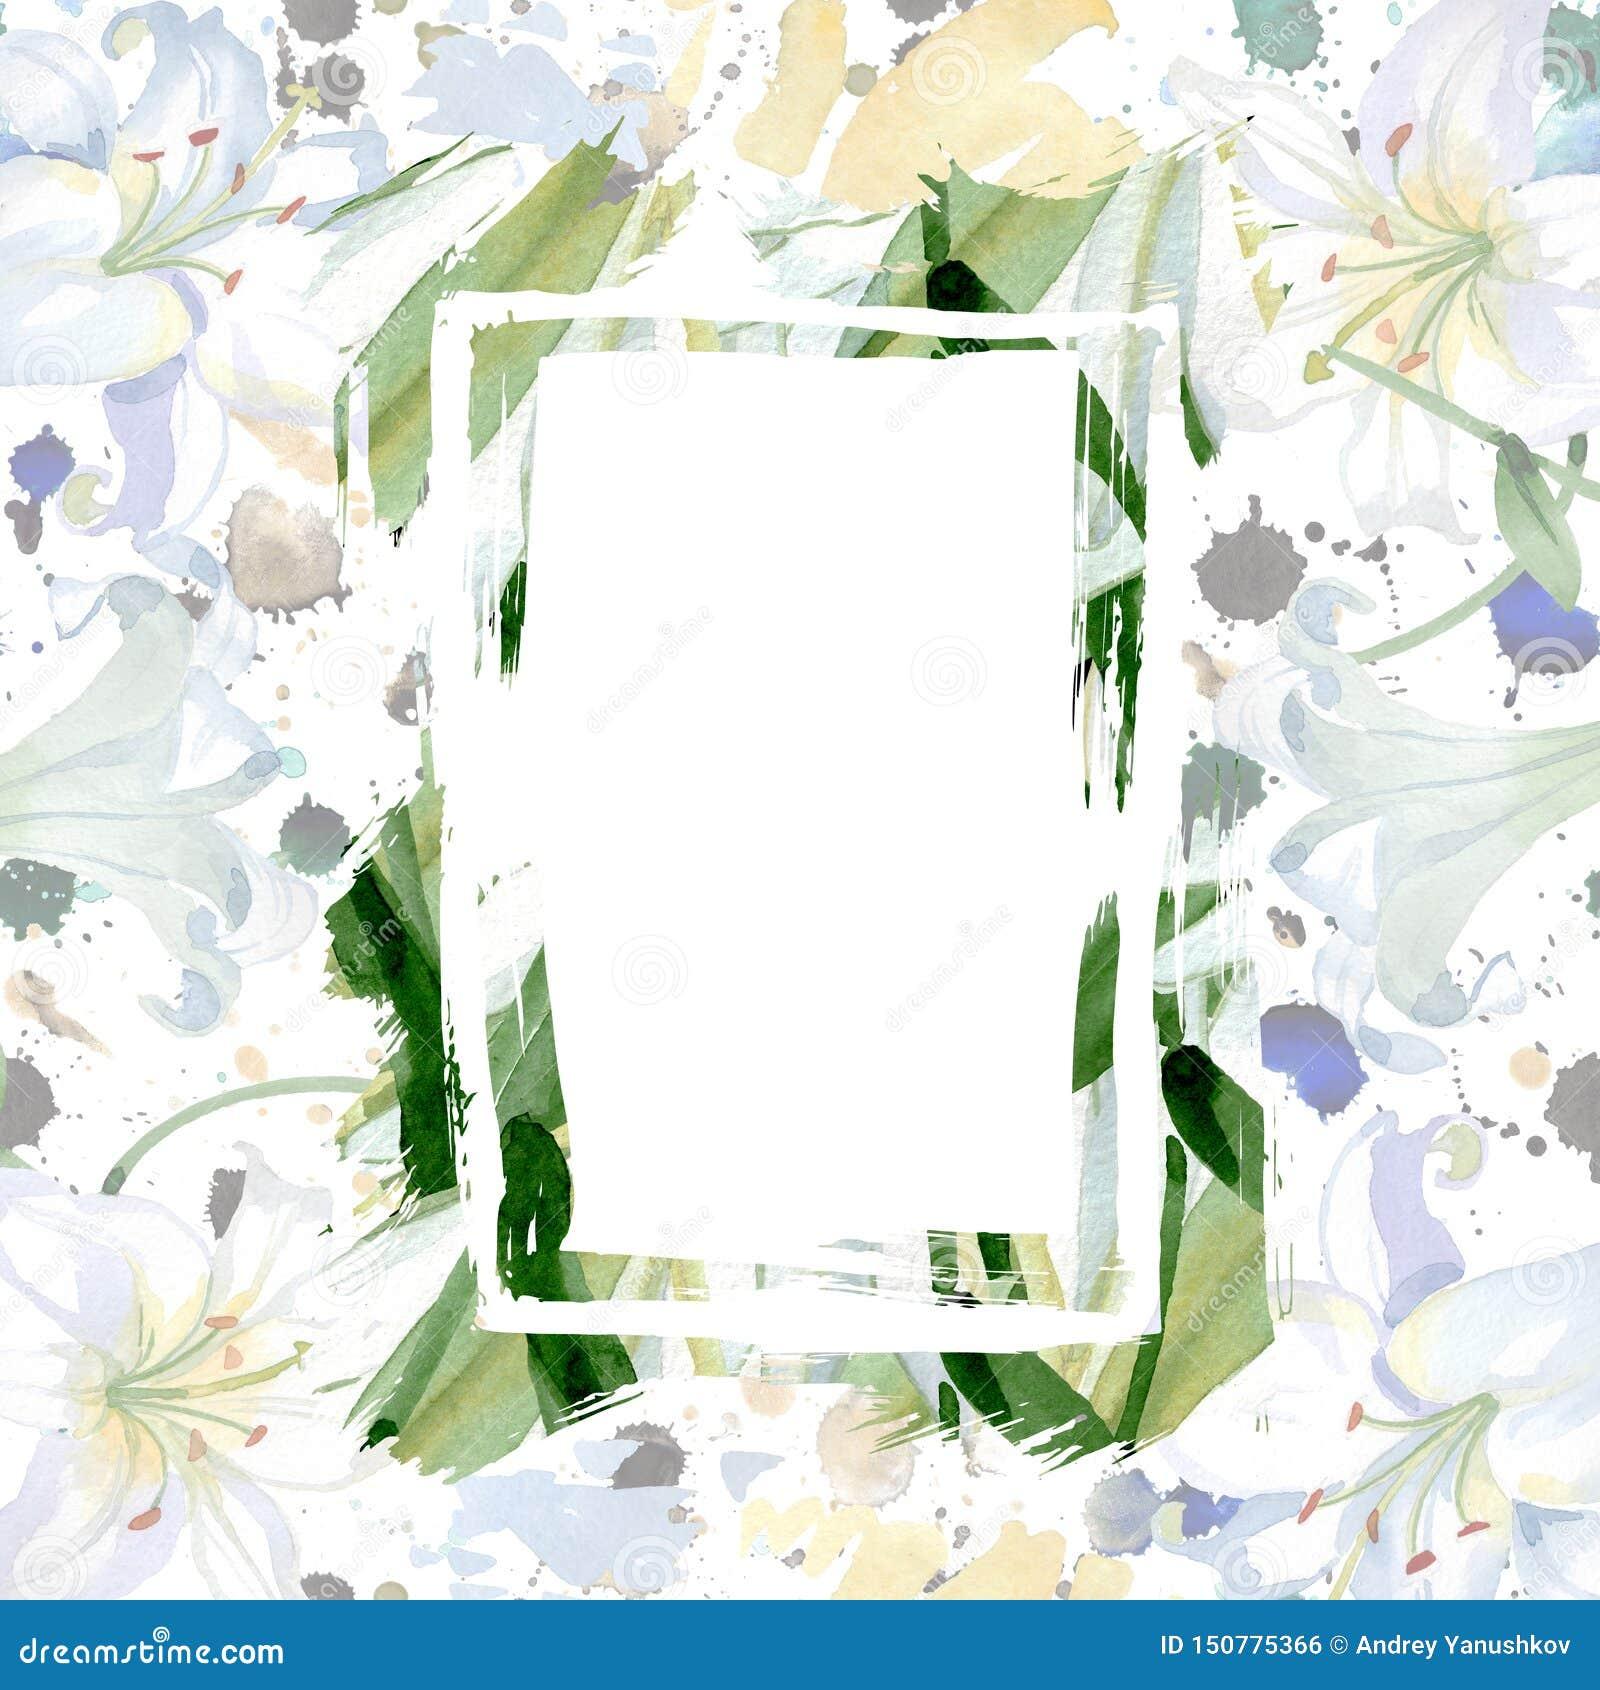 White lily floral botanical flowers. Watercolor background illustration set. Frame border ornament square.